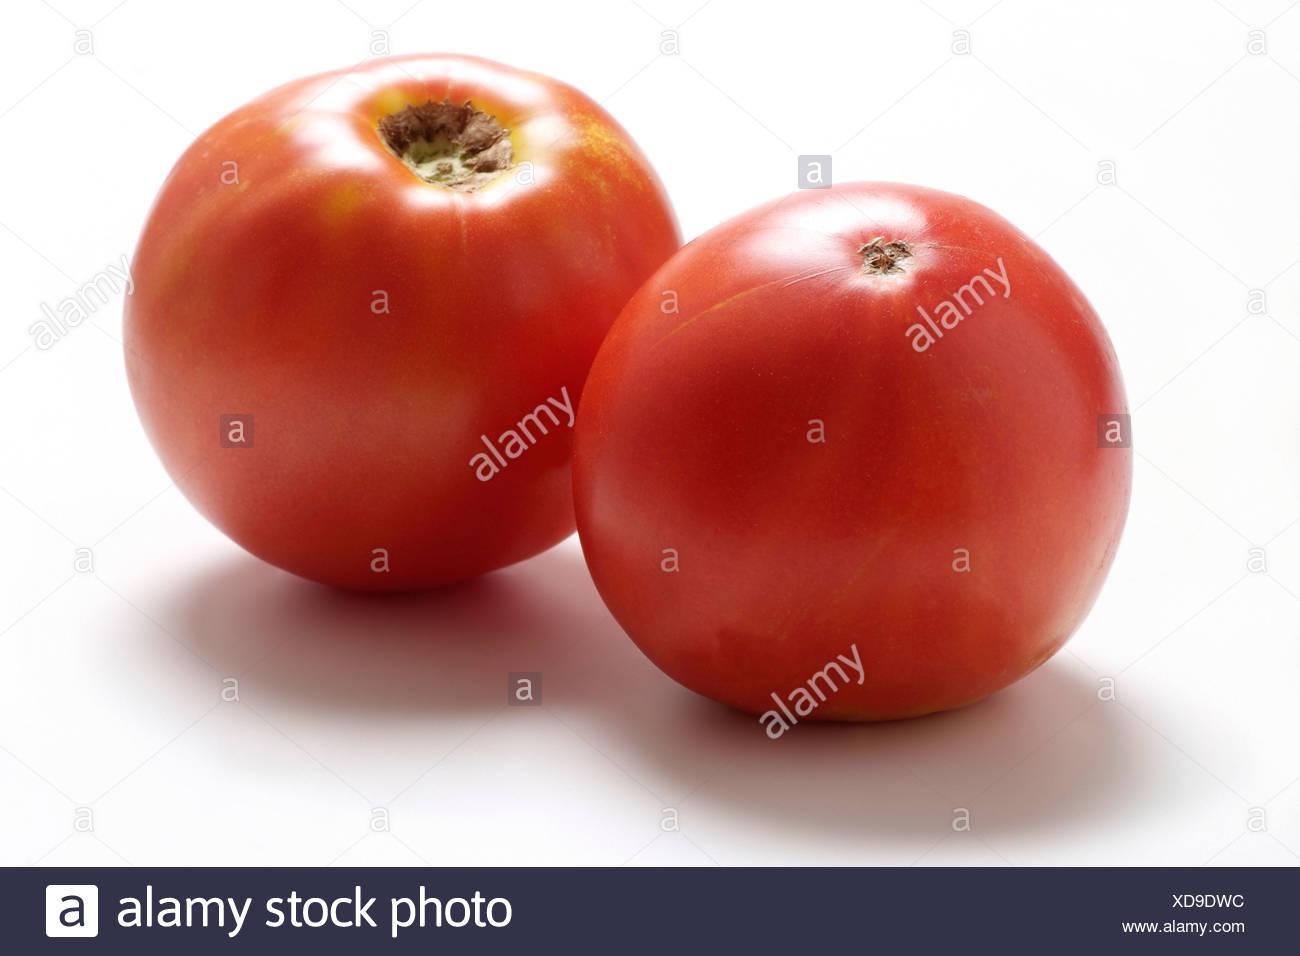 Tomato varieties: Delikata - Stock Image